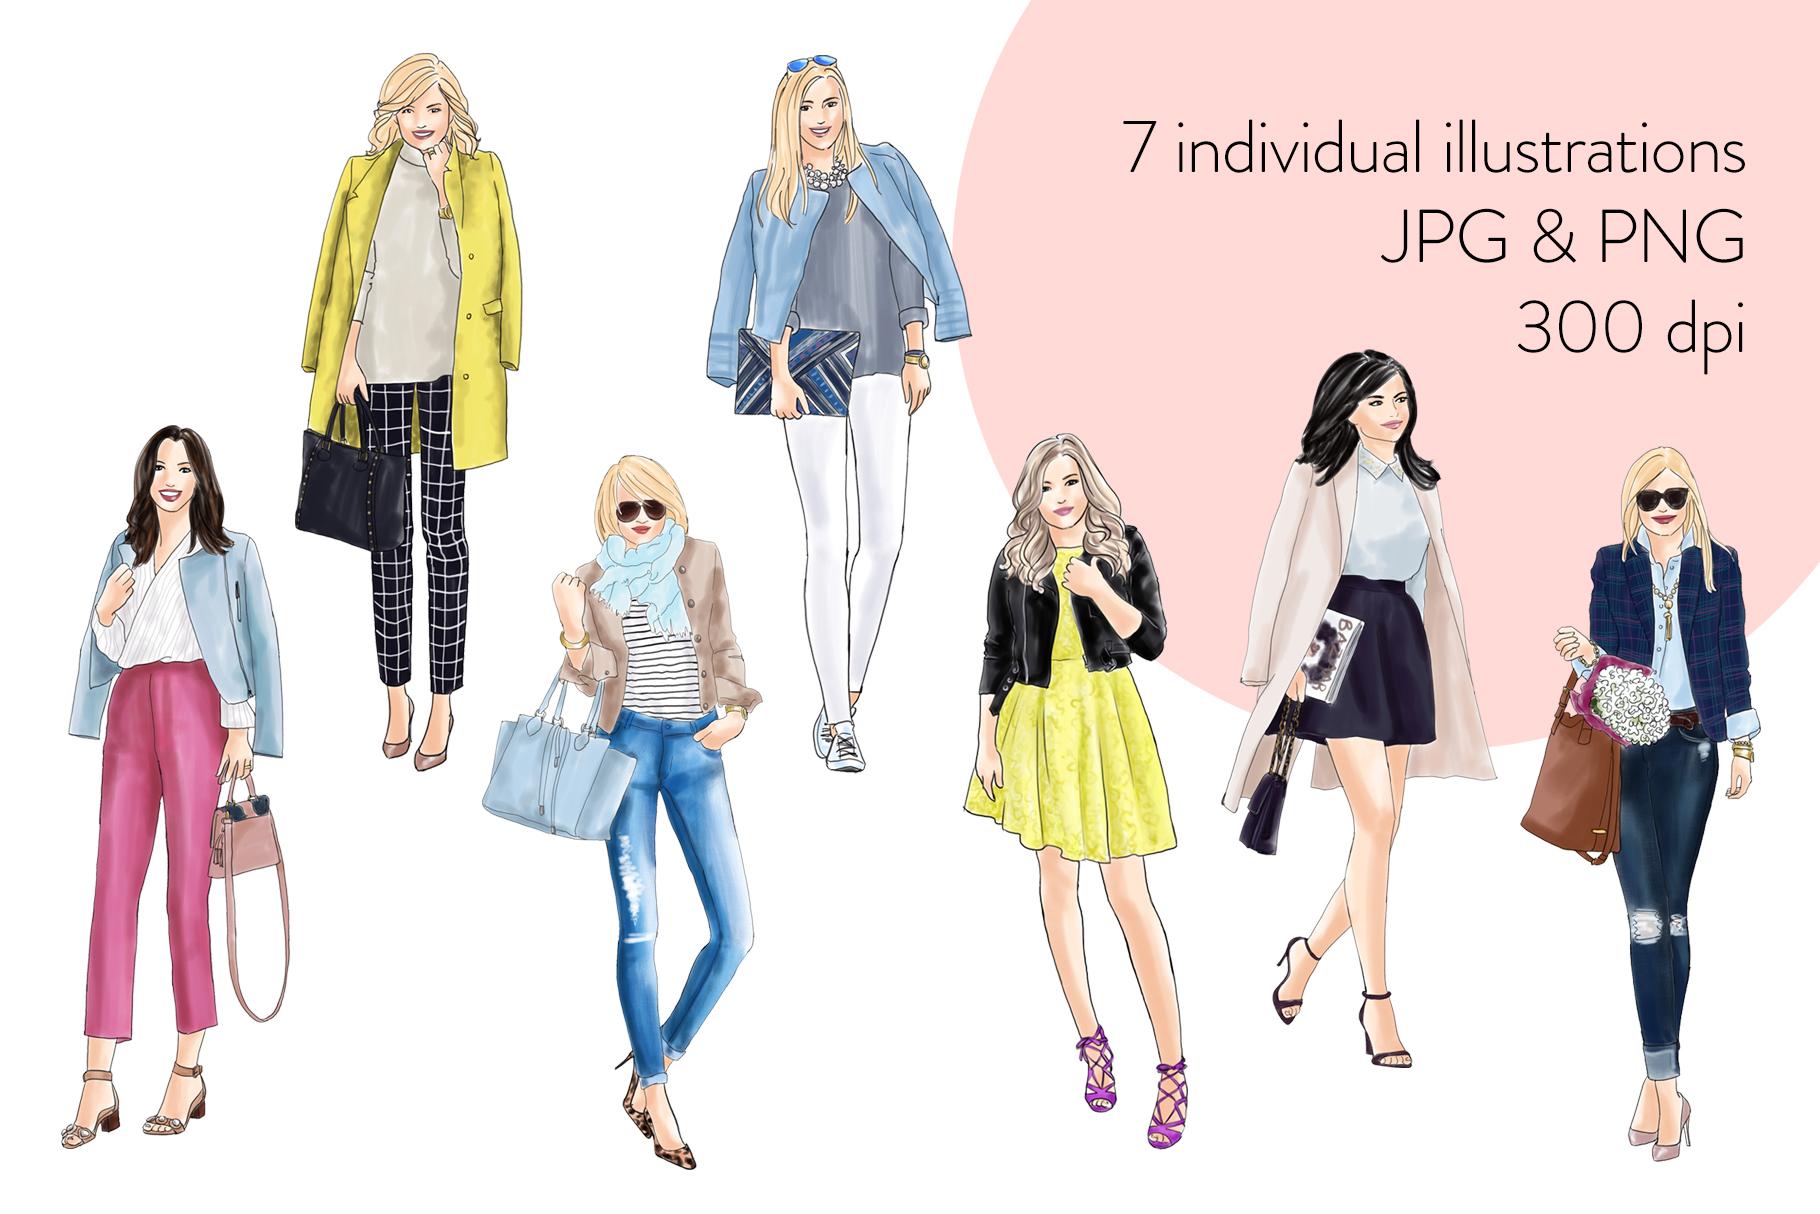 Fashion illustration clipart - Fashion Girls 21 - Light Skin example image 2